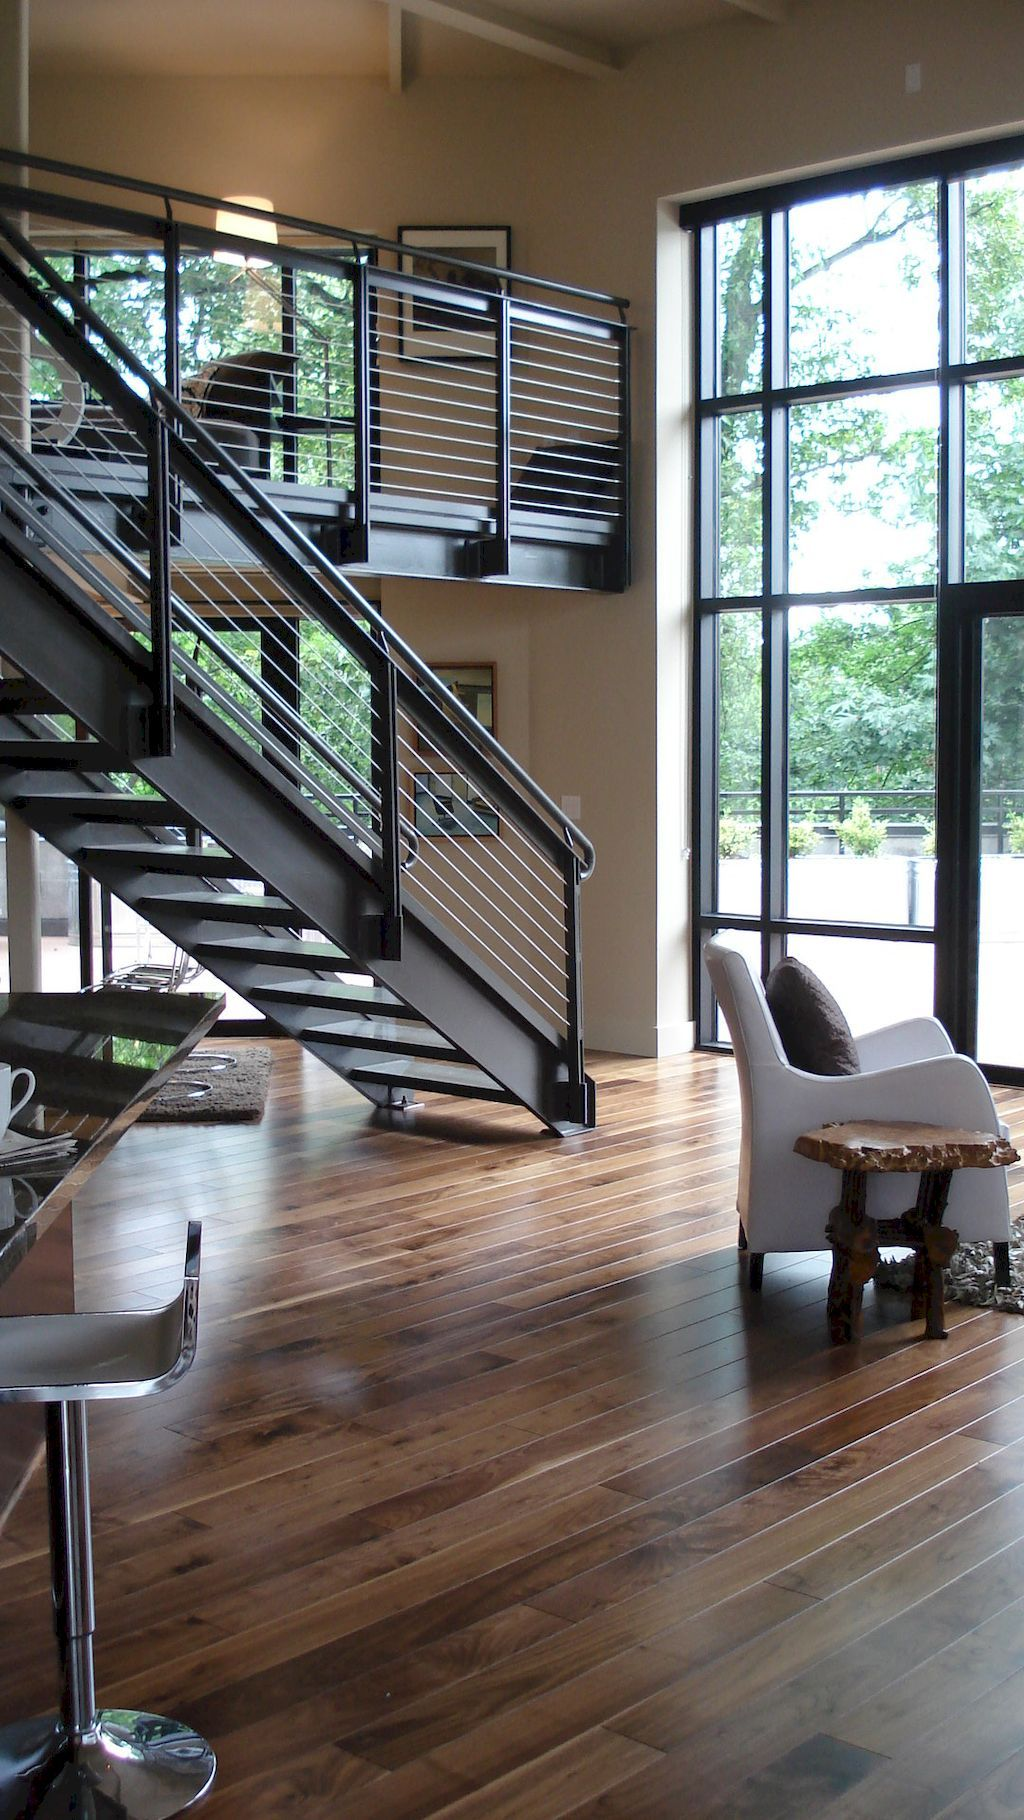 Nice 35 Modern Garage Apartment Designs Ideas Https://decorapatio.com/2017/06/13/35-modern